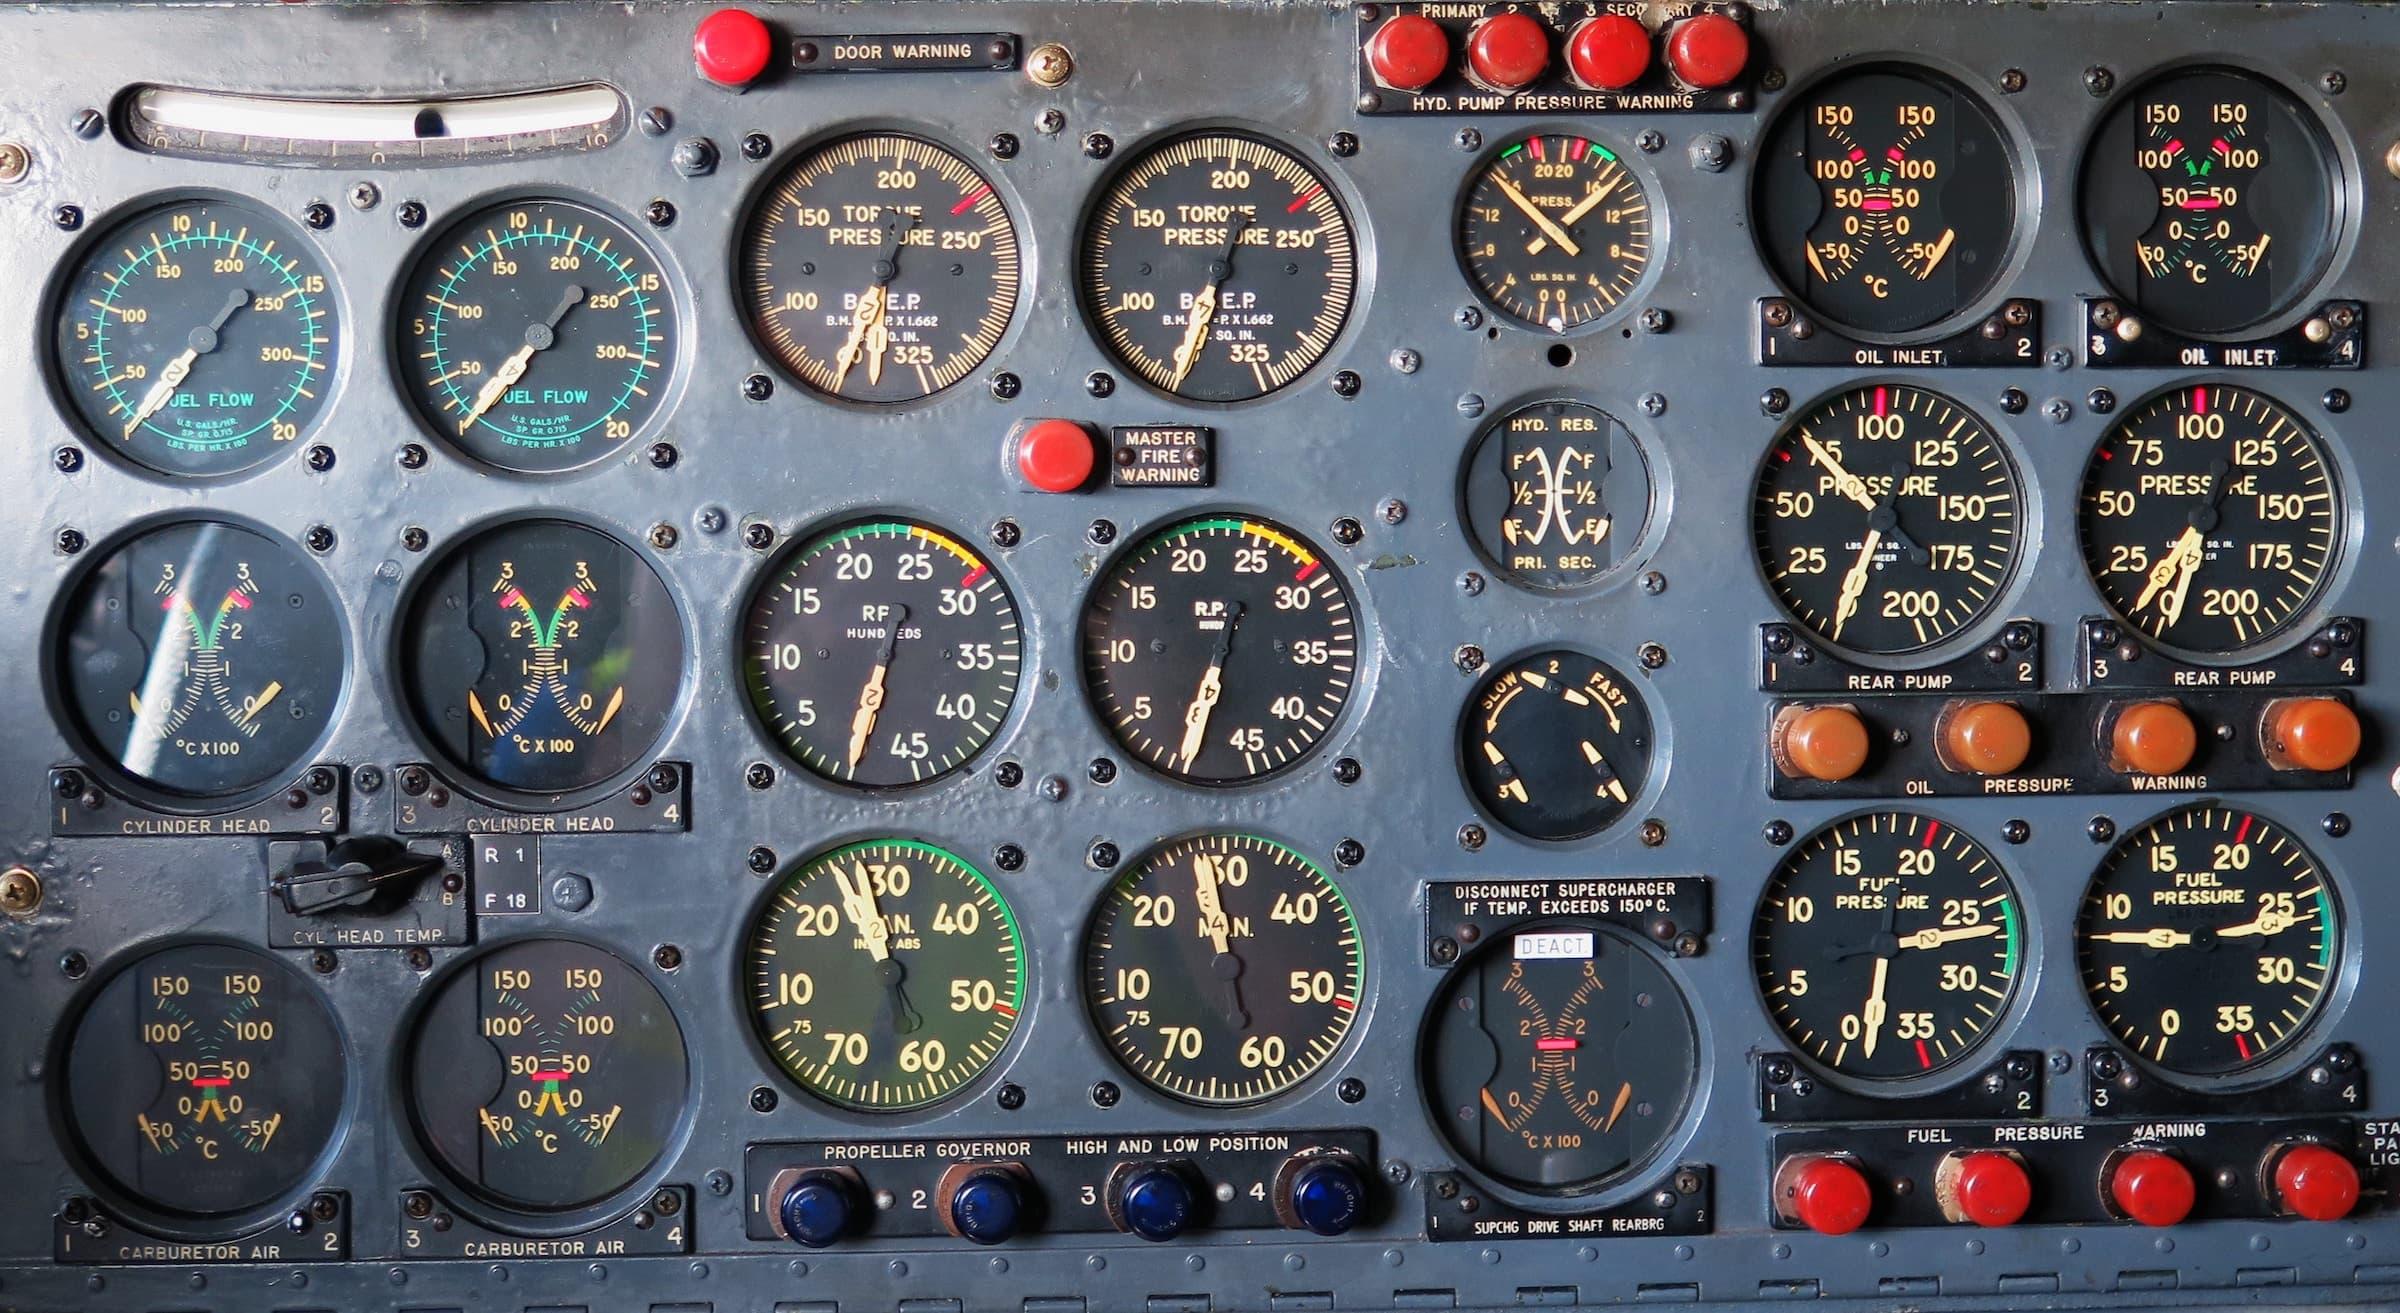 Aircraft instrument panel, photographer Arie Wubben via unsplash.com